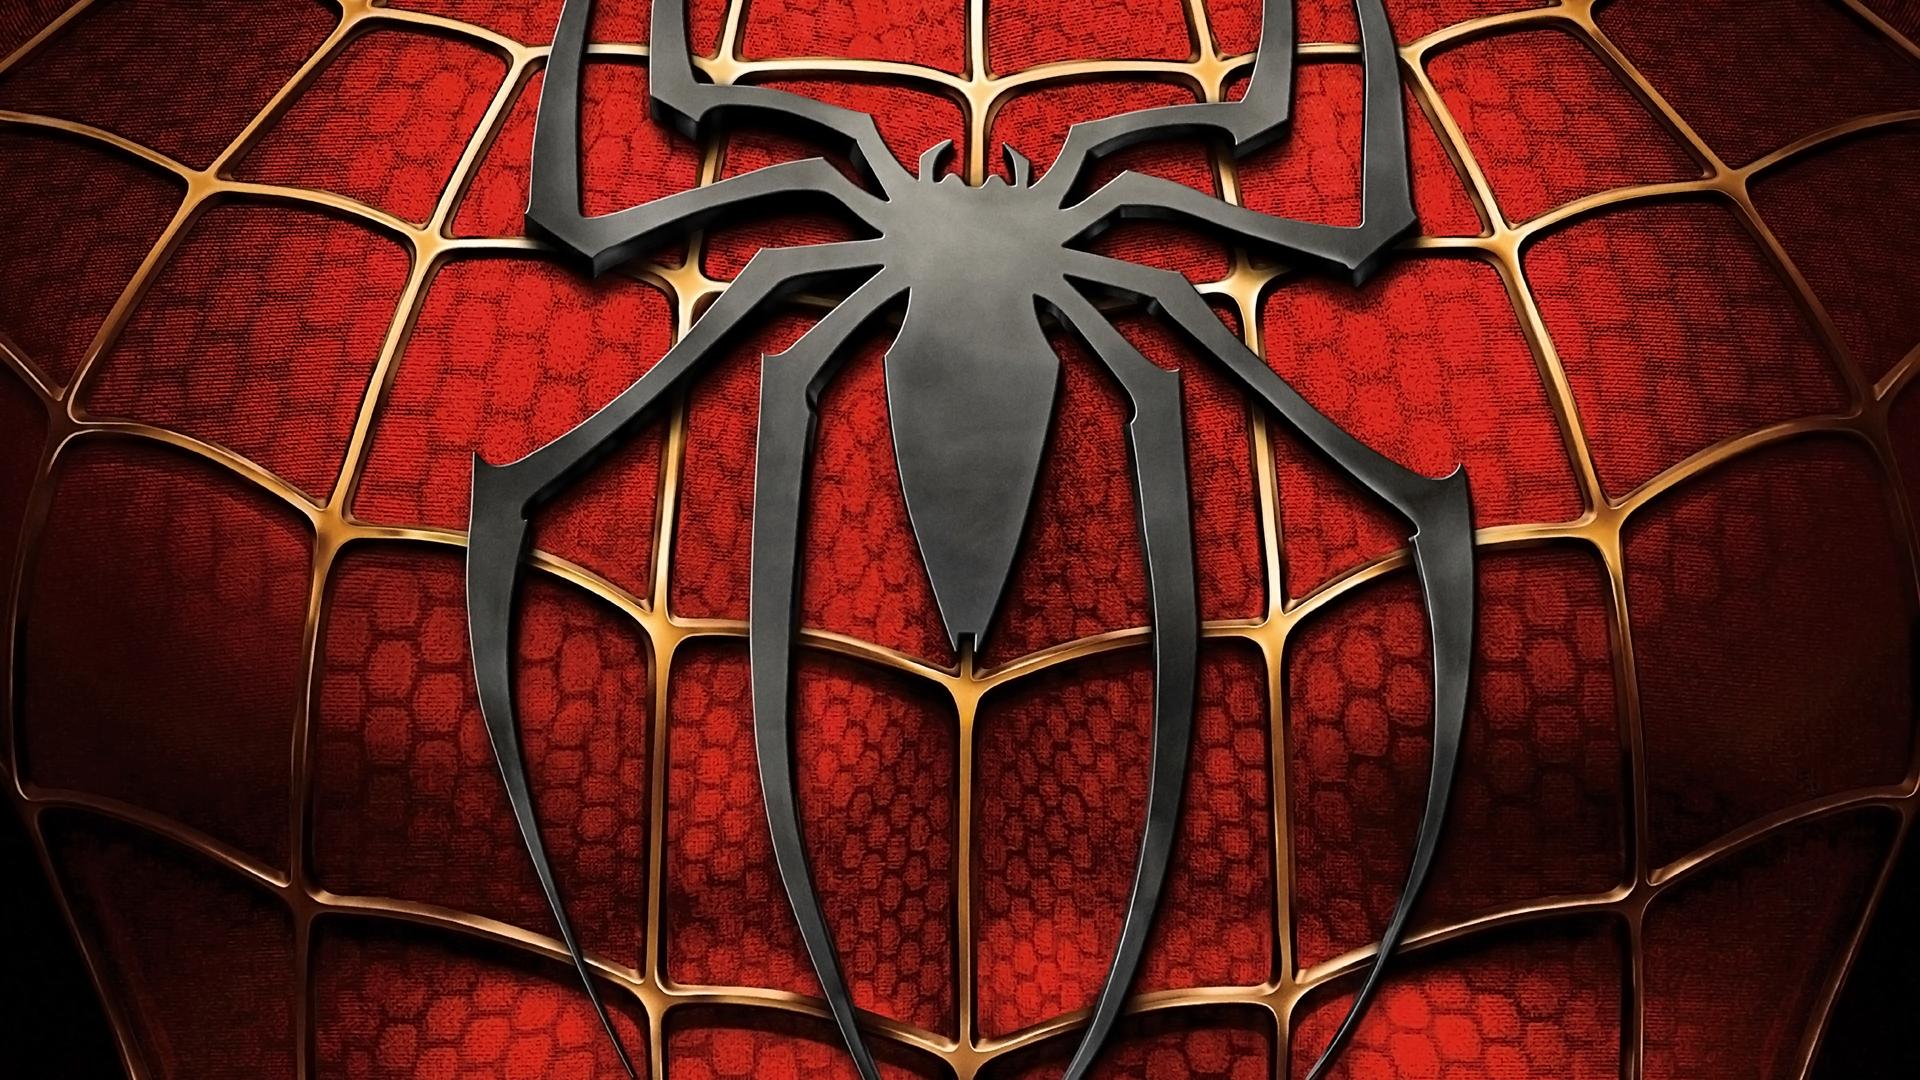 Wallpapers de spiderman en full hd for Fondos de spiderman